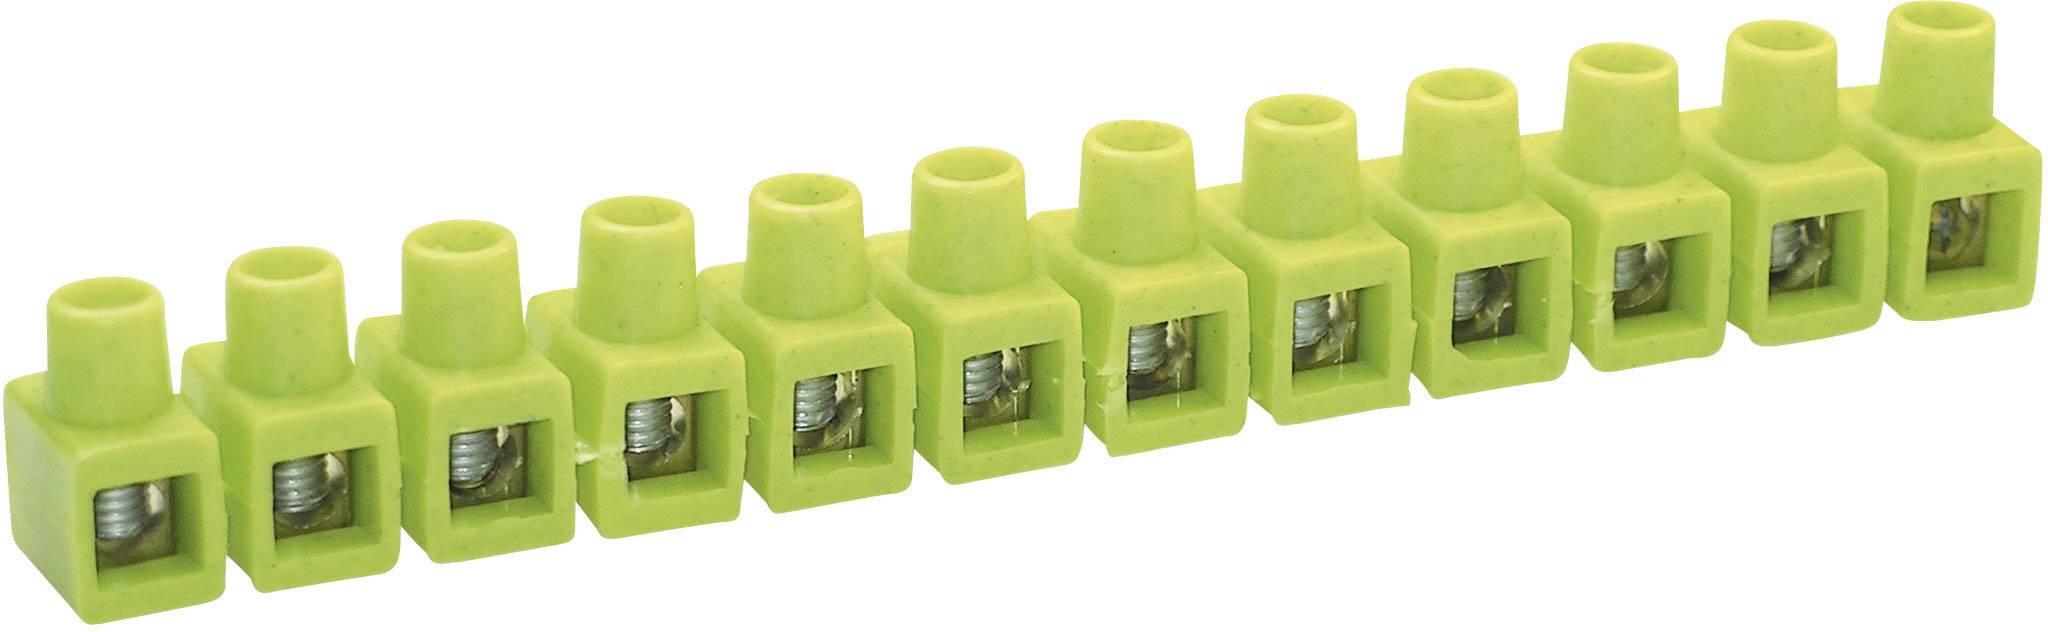 Krabicová svorka Kaiser na kábel s rozmerom 2.5-6 mm², pólů 12, 1 ks, zelenožltá